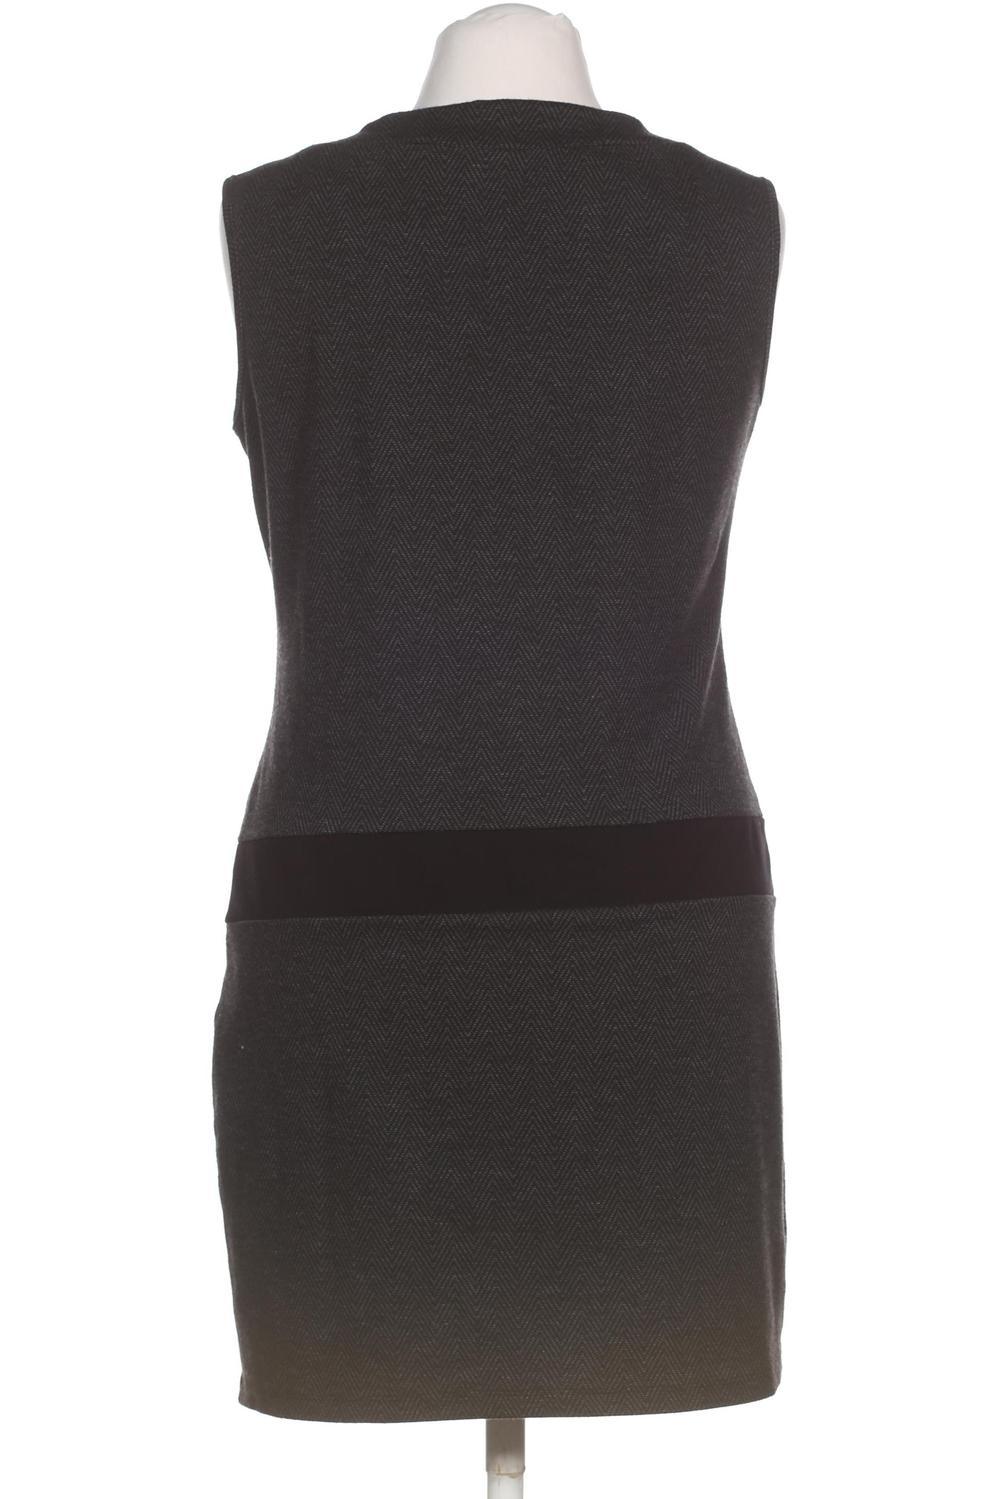 Gerry Weber Damen Kleid INT L Second Hand kaufen | ubup